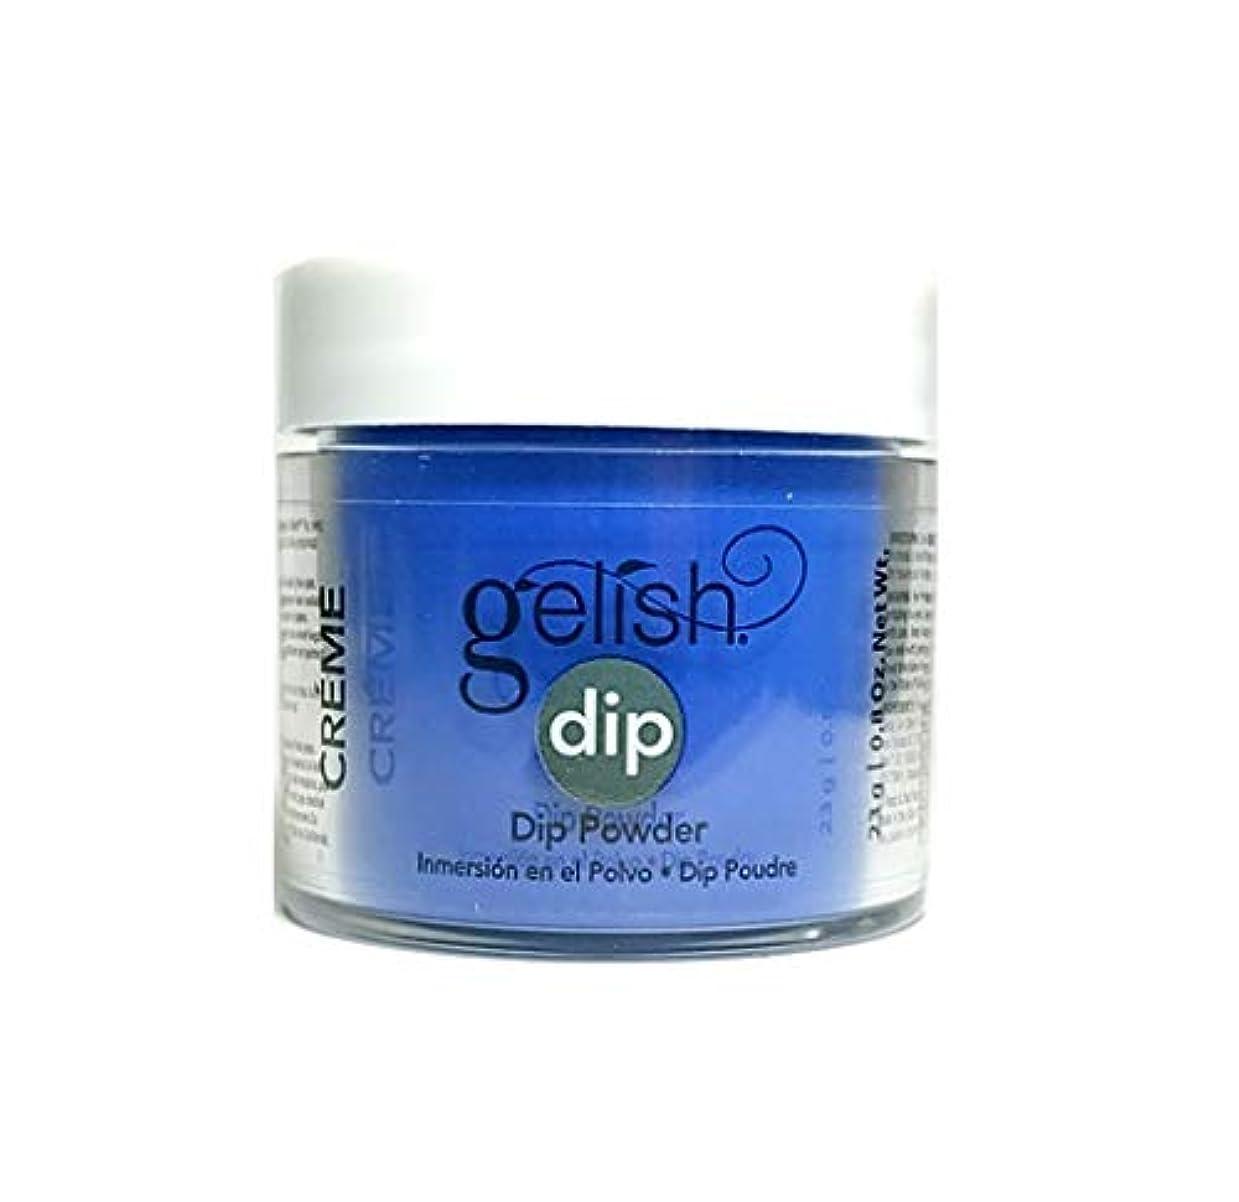 沼地新着考慮Harmony Gelish - Dip Powder - After Dark - 23g / 0.8oz